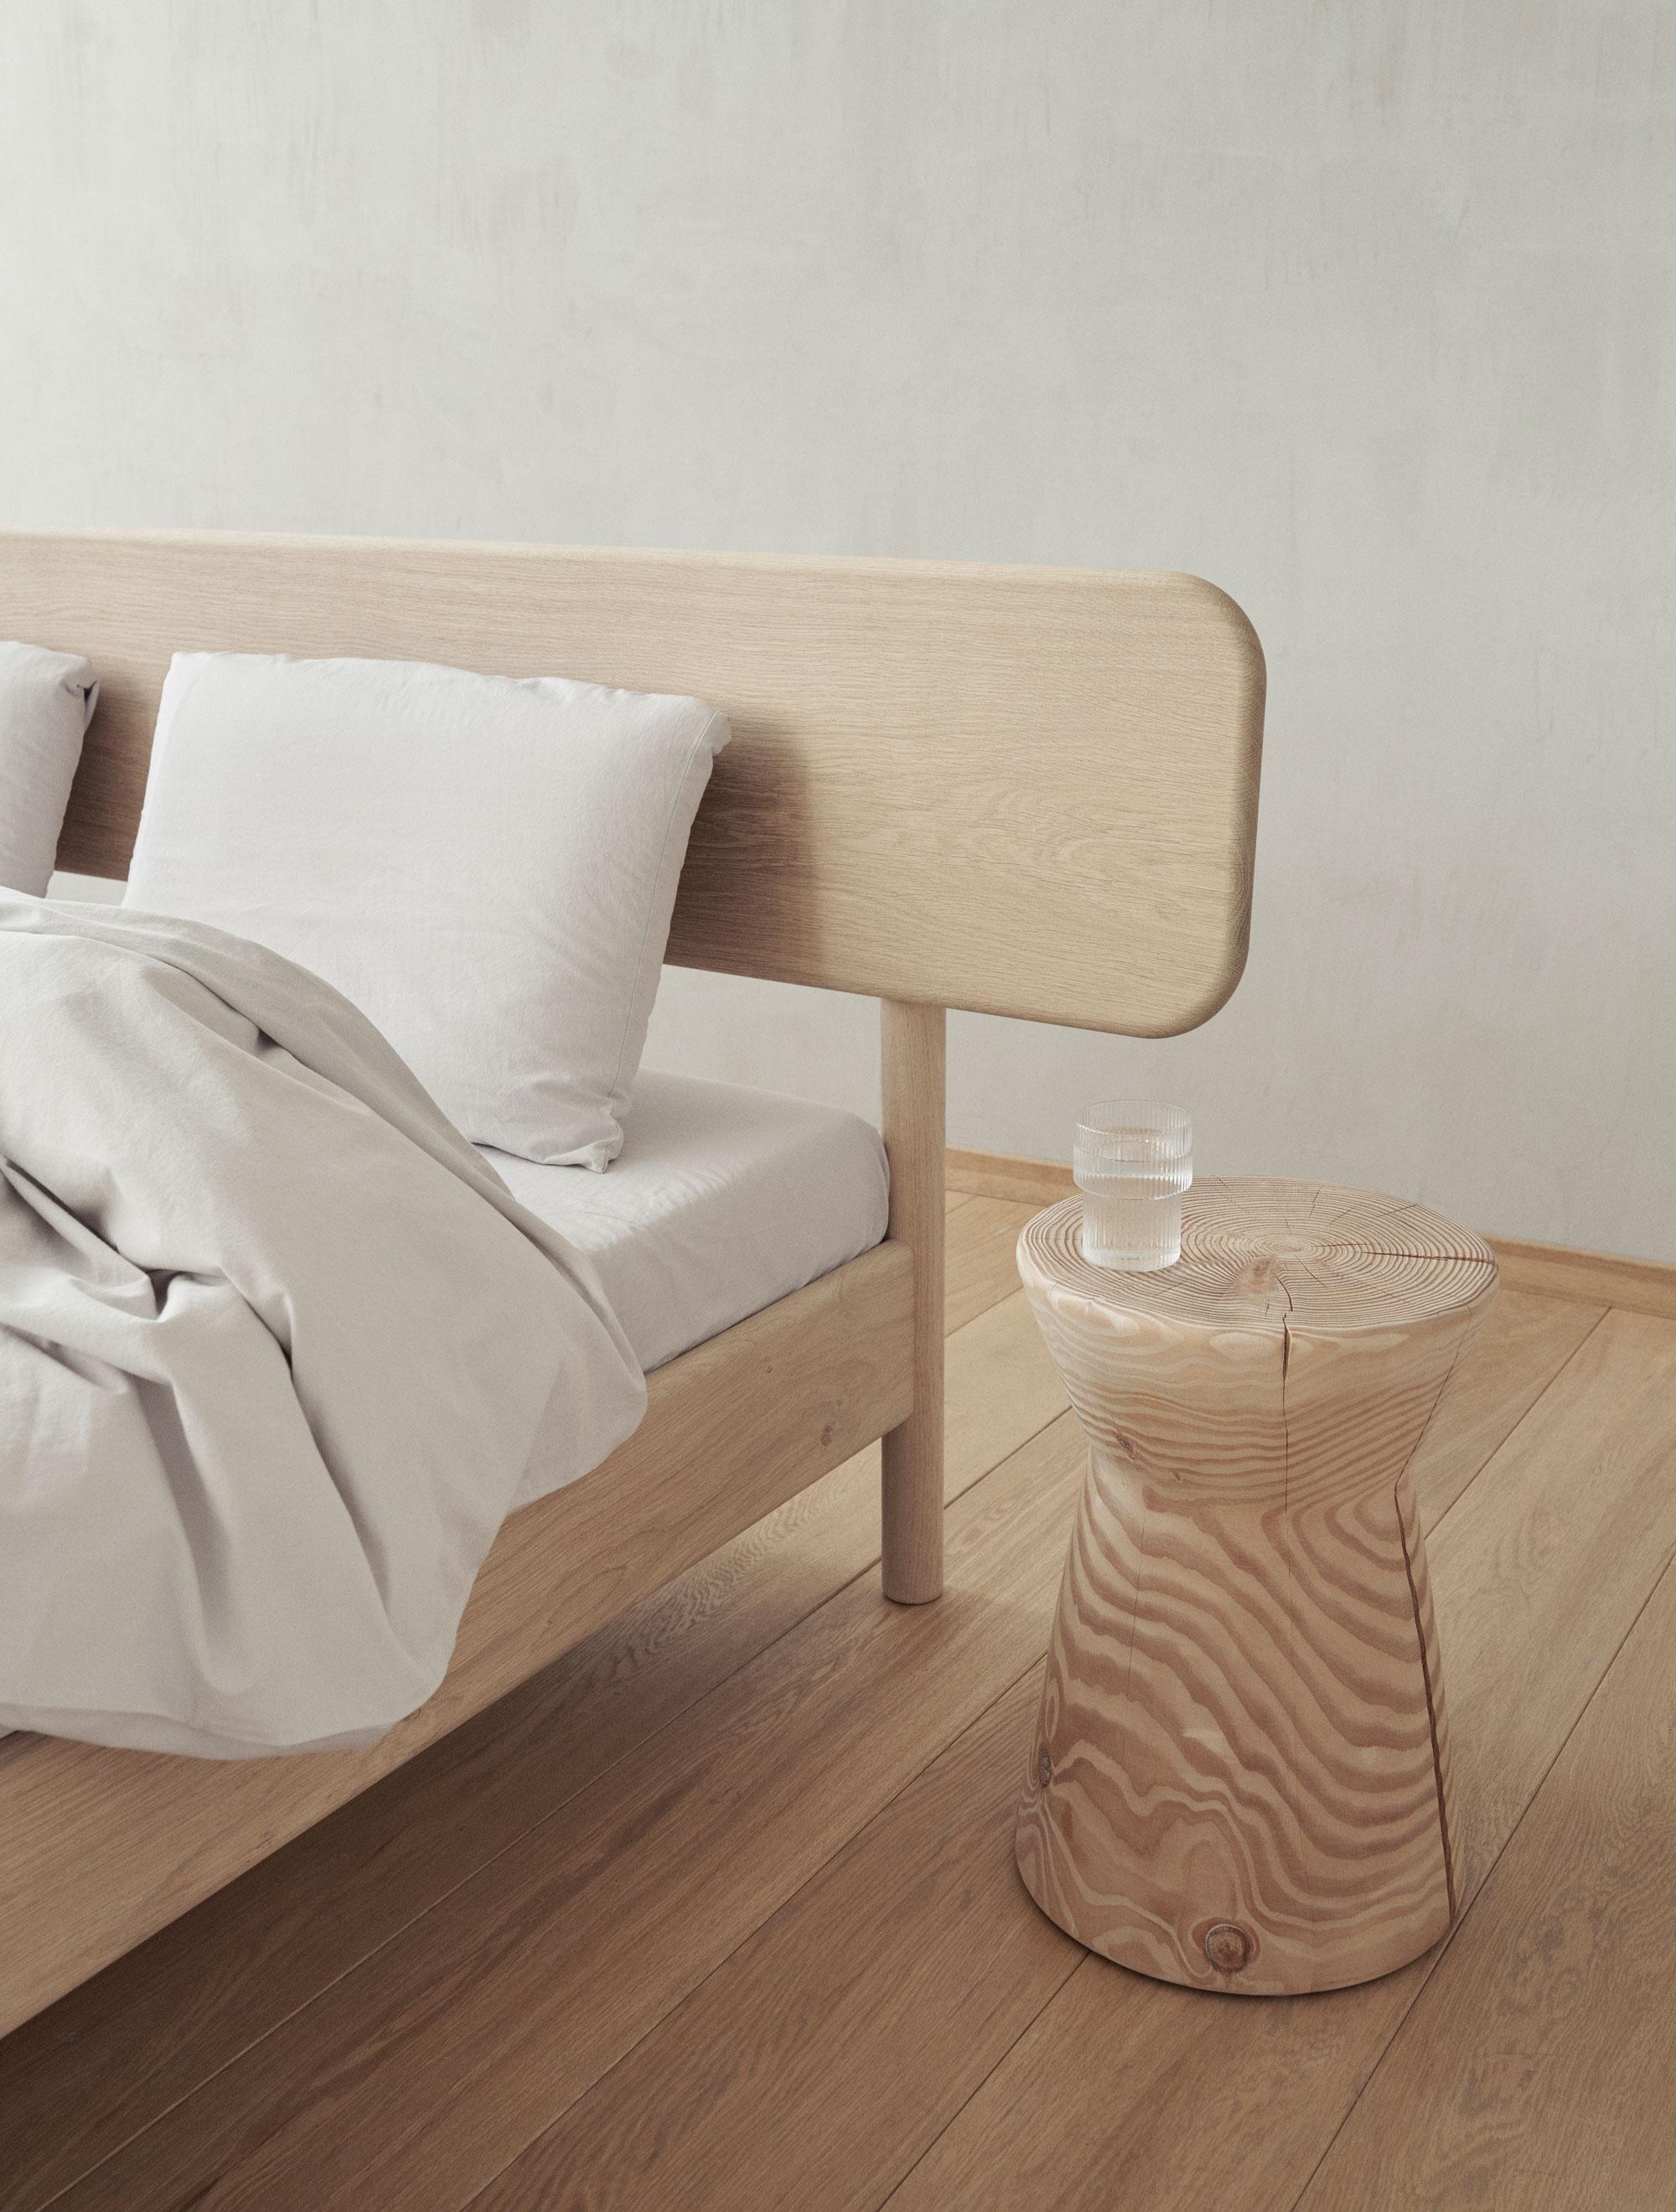 05---ALKEN-BED-AT-THE-LAB---RE-BEDS---DESIGN-BY-OLIVER-&-LUKAS-WEISSKROGH.jpg